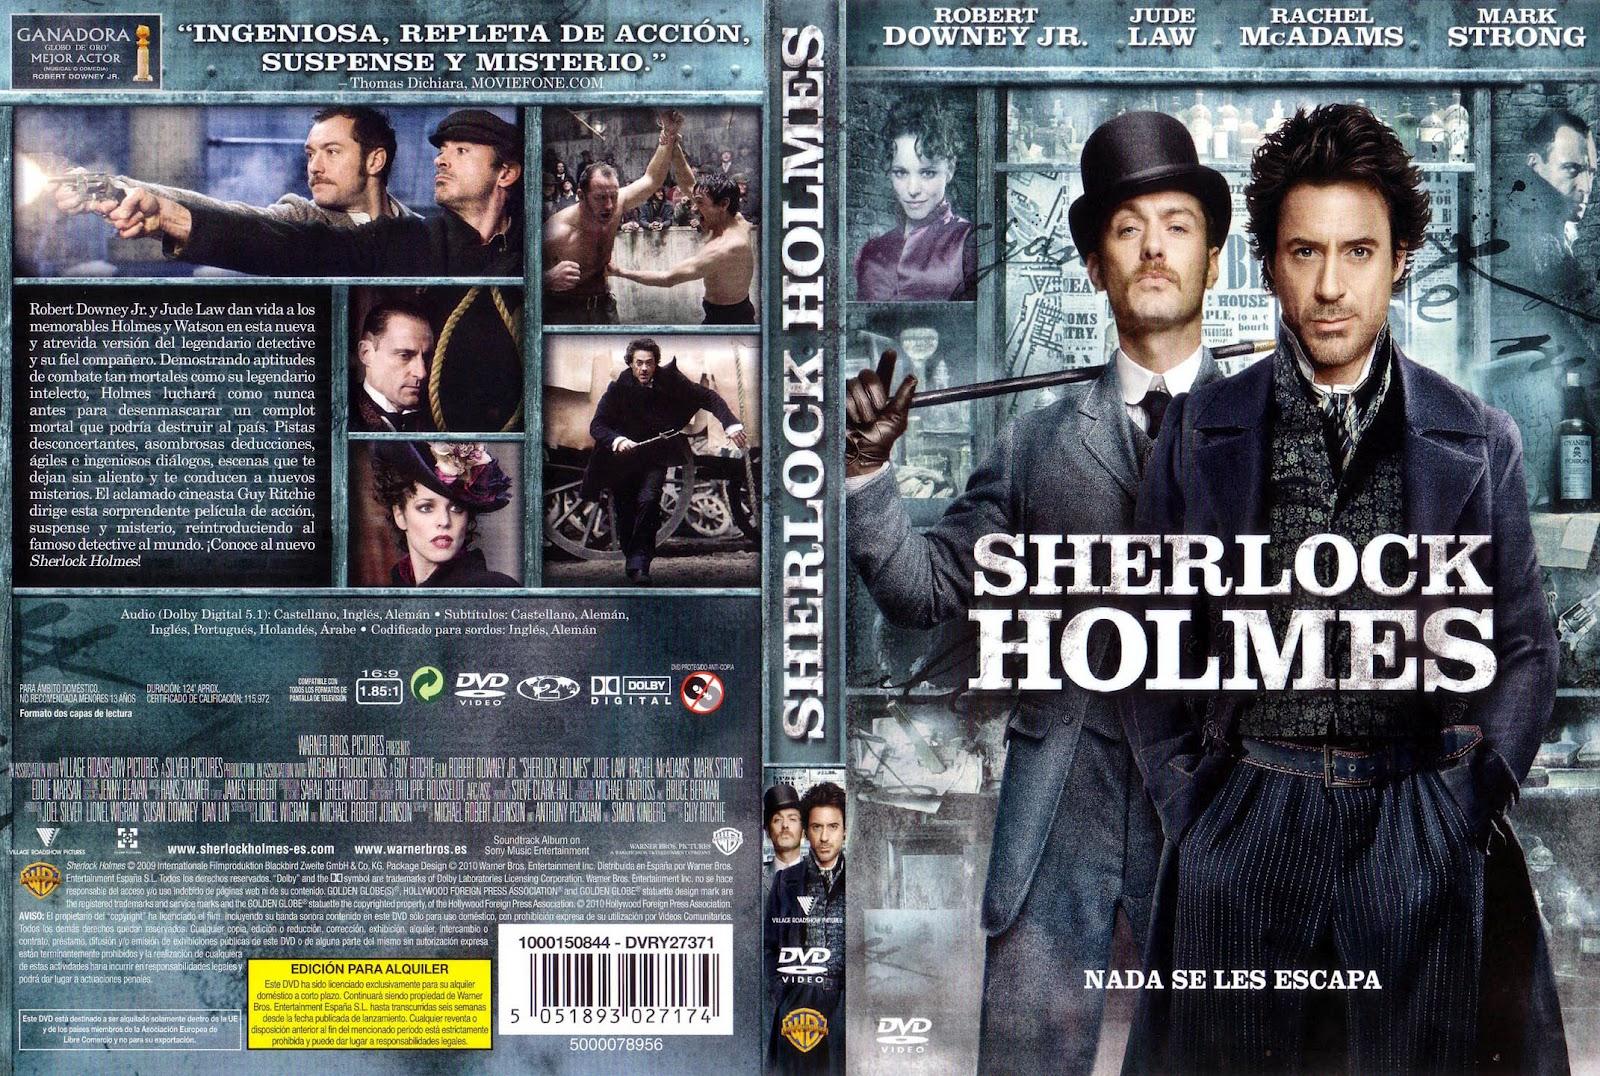 http://3.bp.blogspot.com/-QfmZaBEz8Xg/TzW7ZJKAxUI/AAAAAAAADZU/Alr1mlceWlA/s1600/Sherlock_Holmes-Caratula.jpg